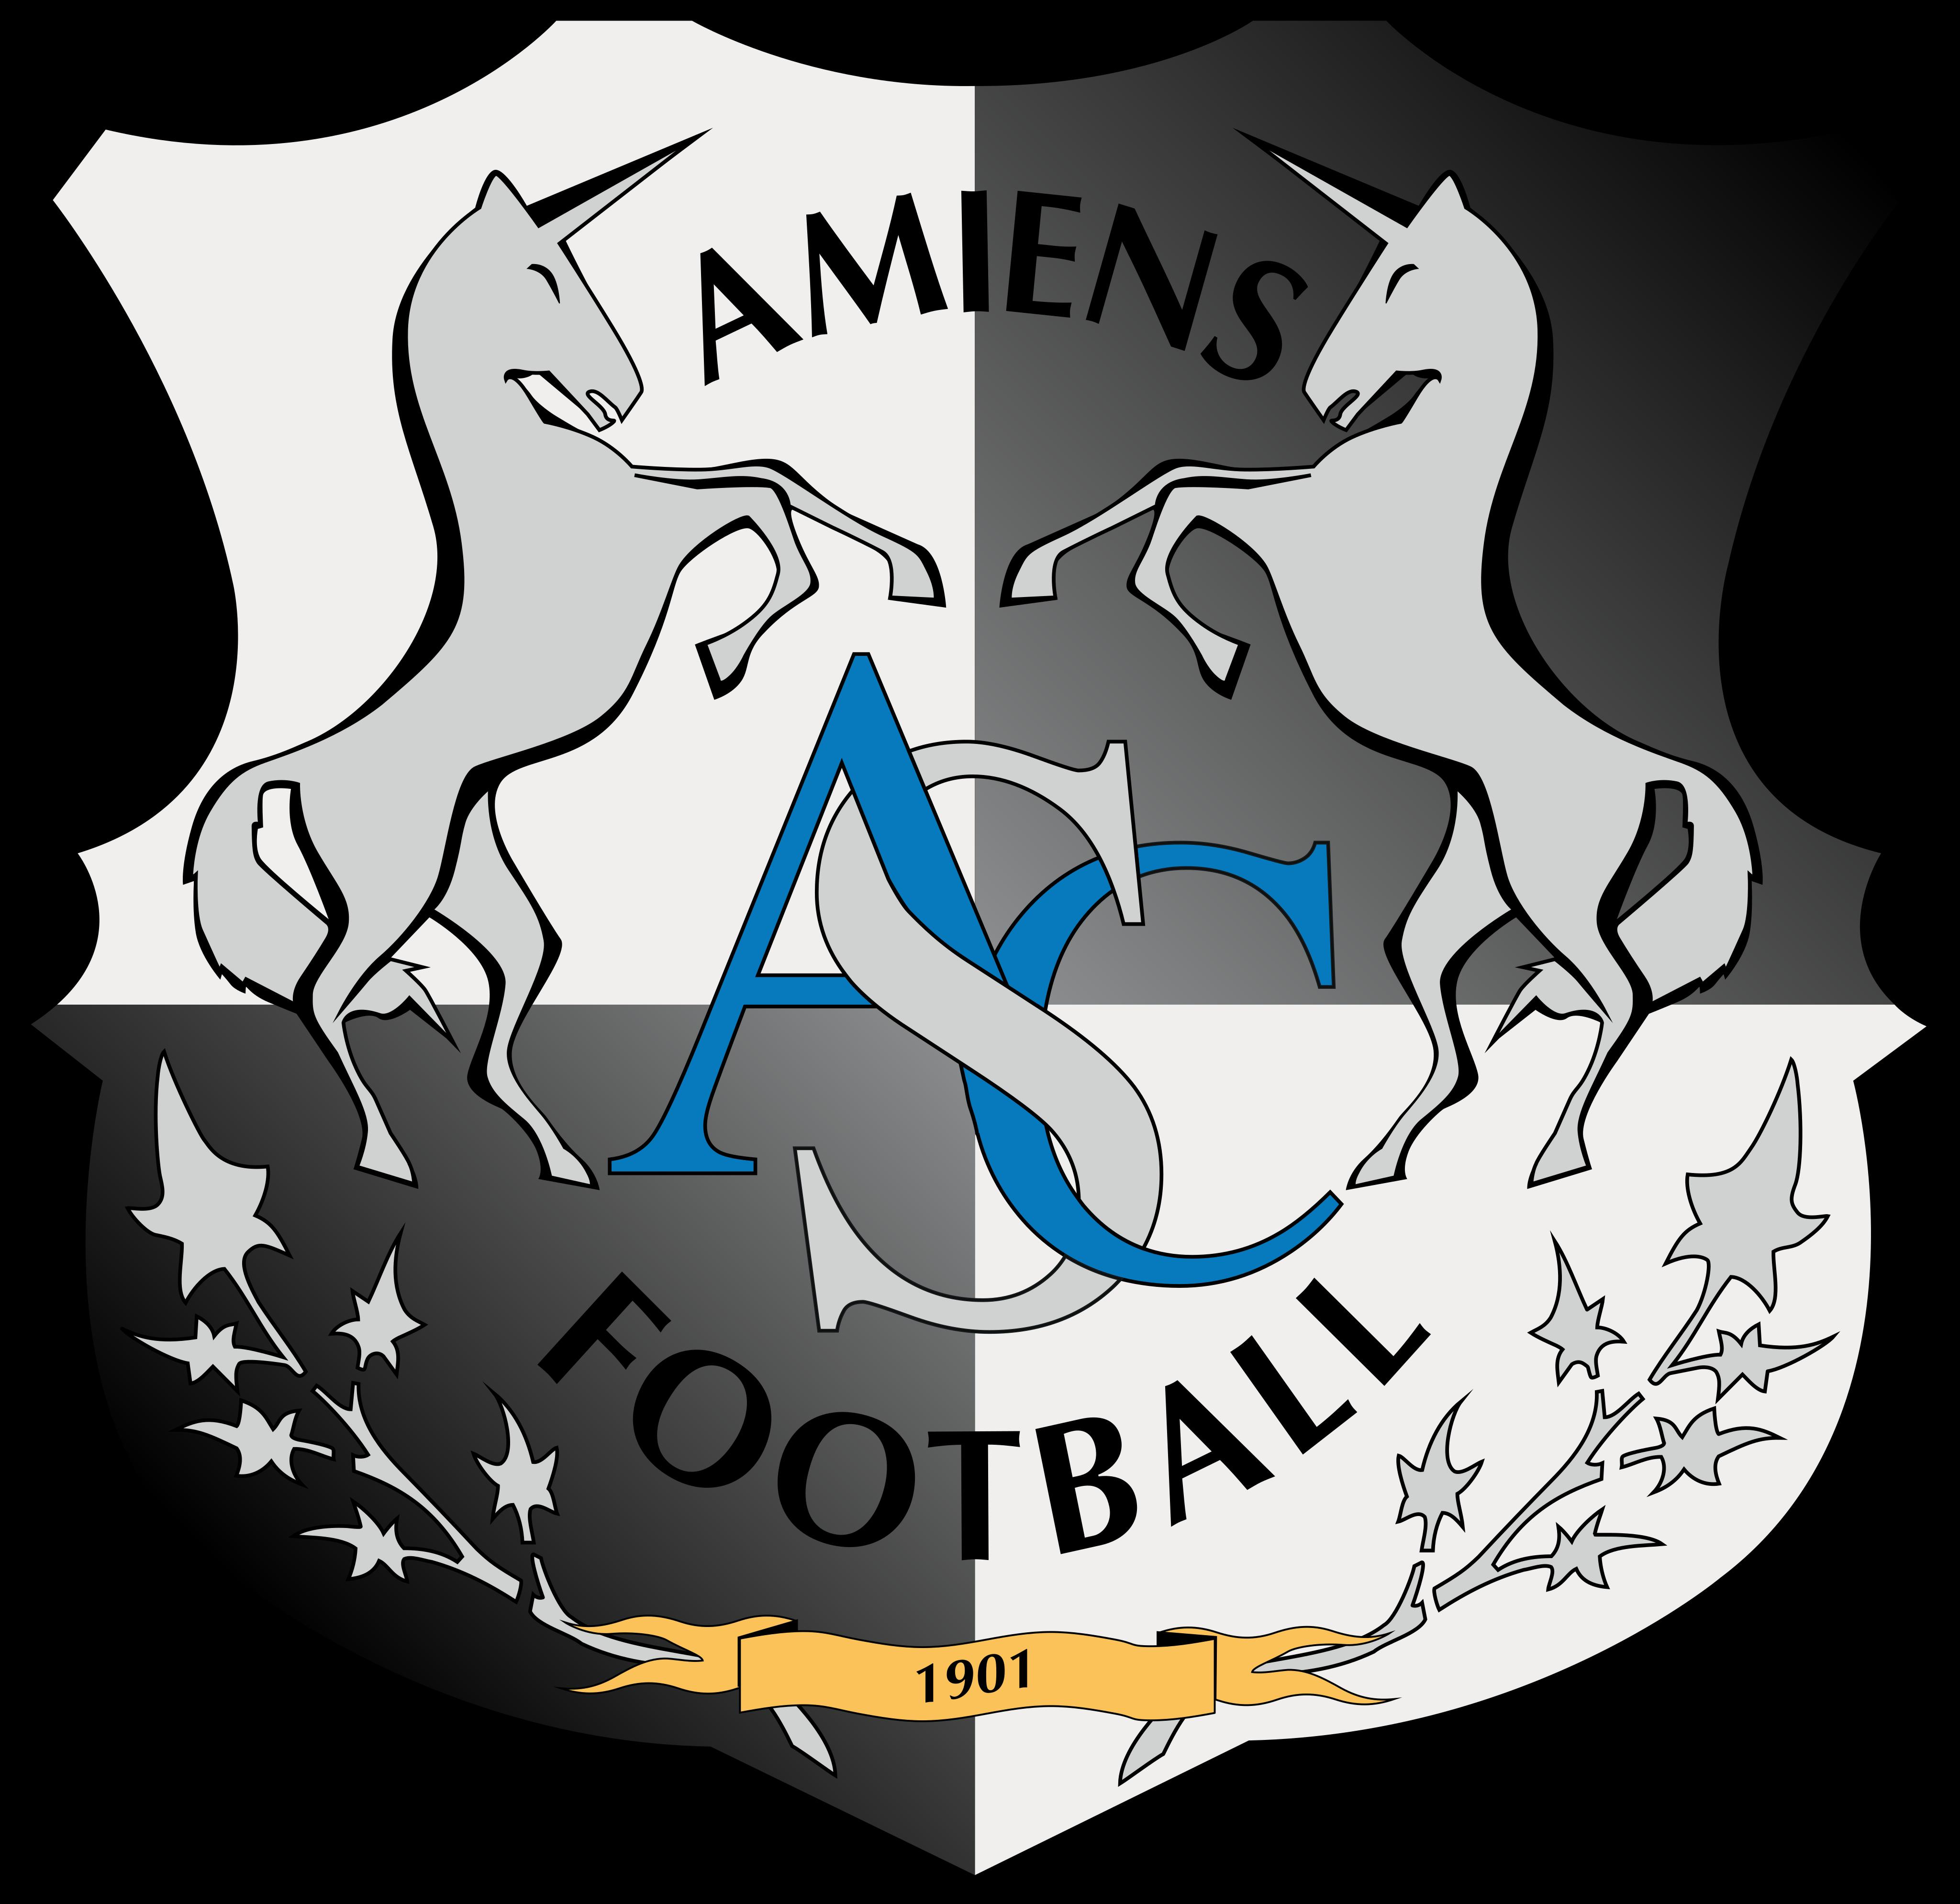 amiens sfc logo - Amiens SCF Logo